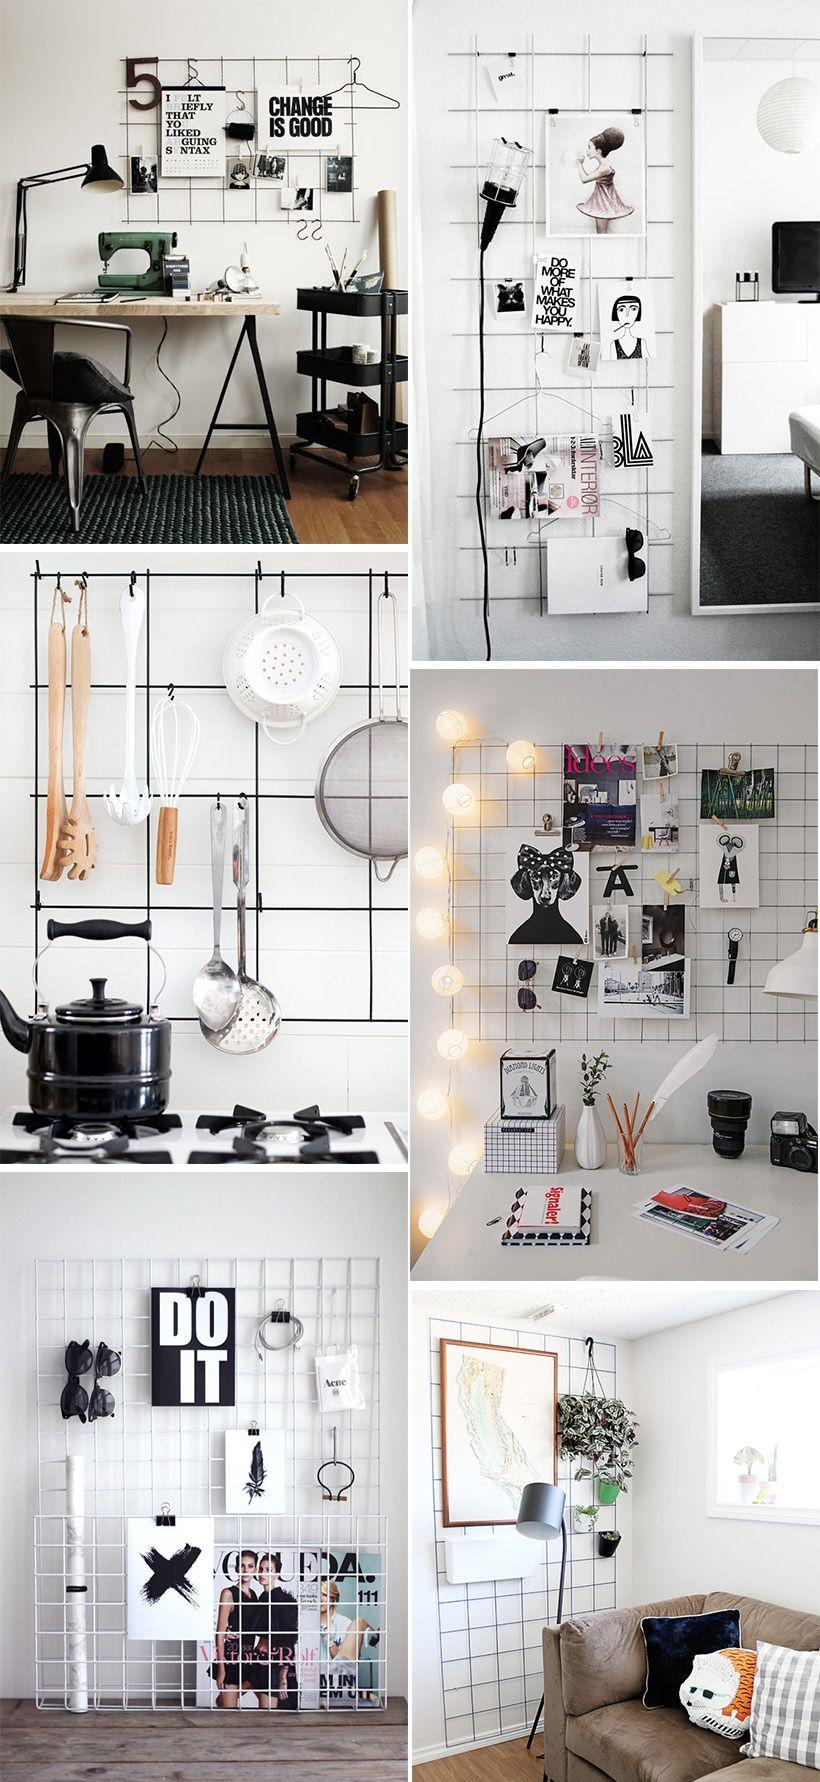 diy inspiration metal grid bedroom ideas pinterest decor home decor and home. Black Bedroom Furniture Sets. Home Design Ideas